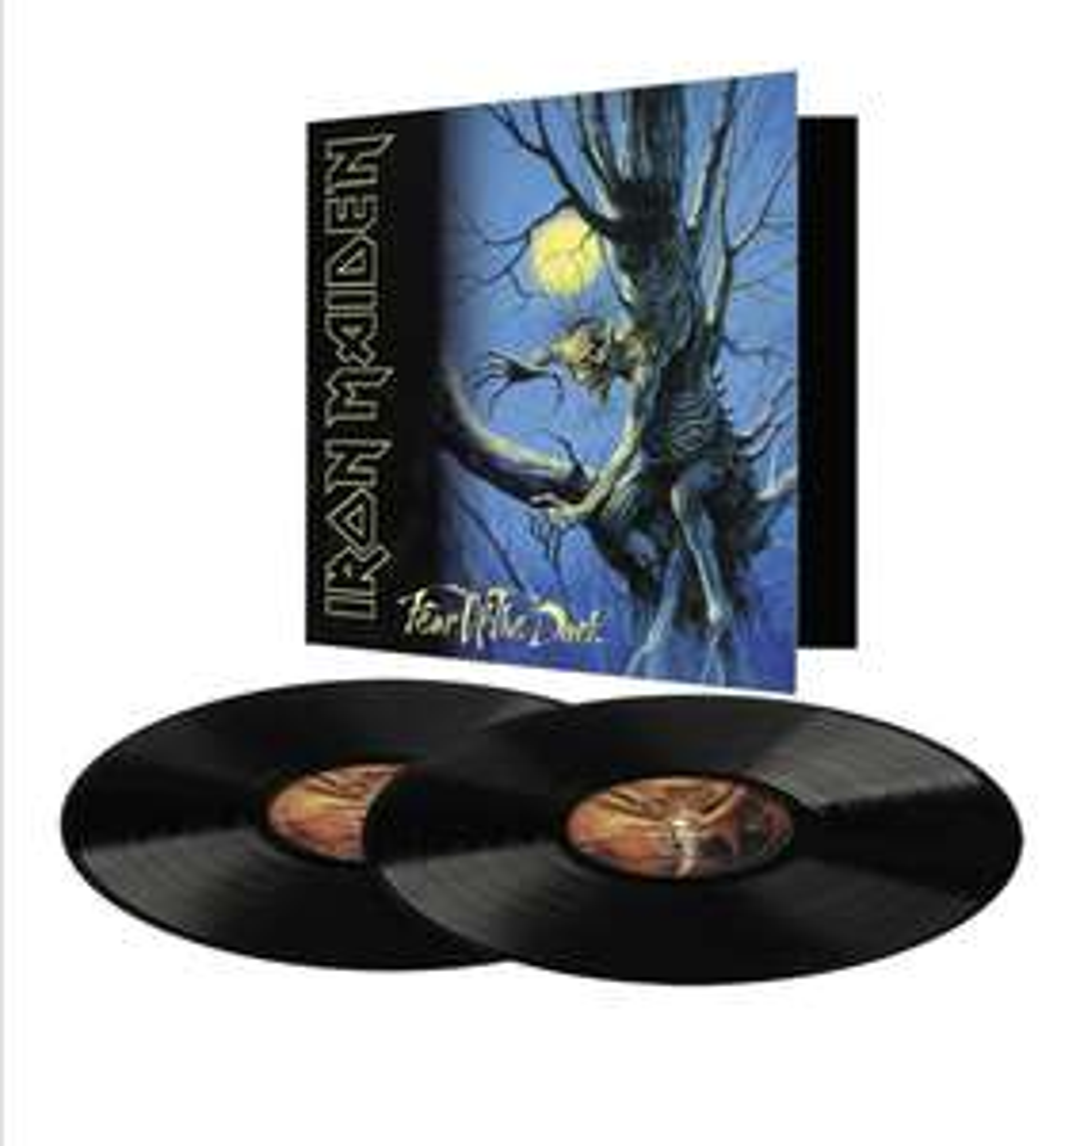 Iron Maiden - Fear of the Dark 2015 Remastered Vinyl LP